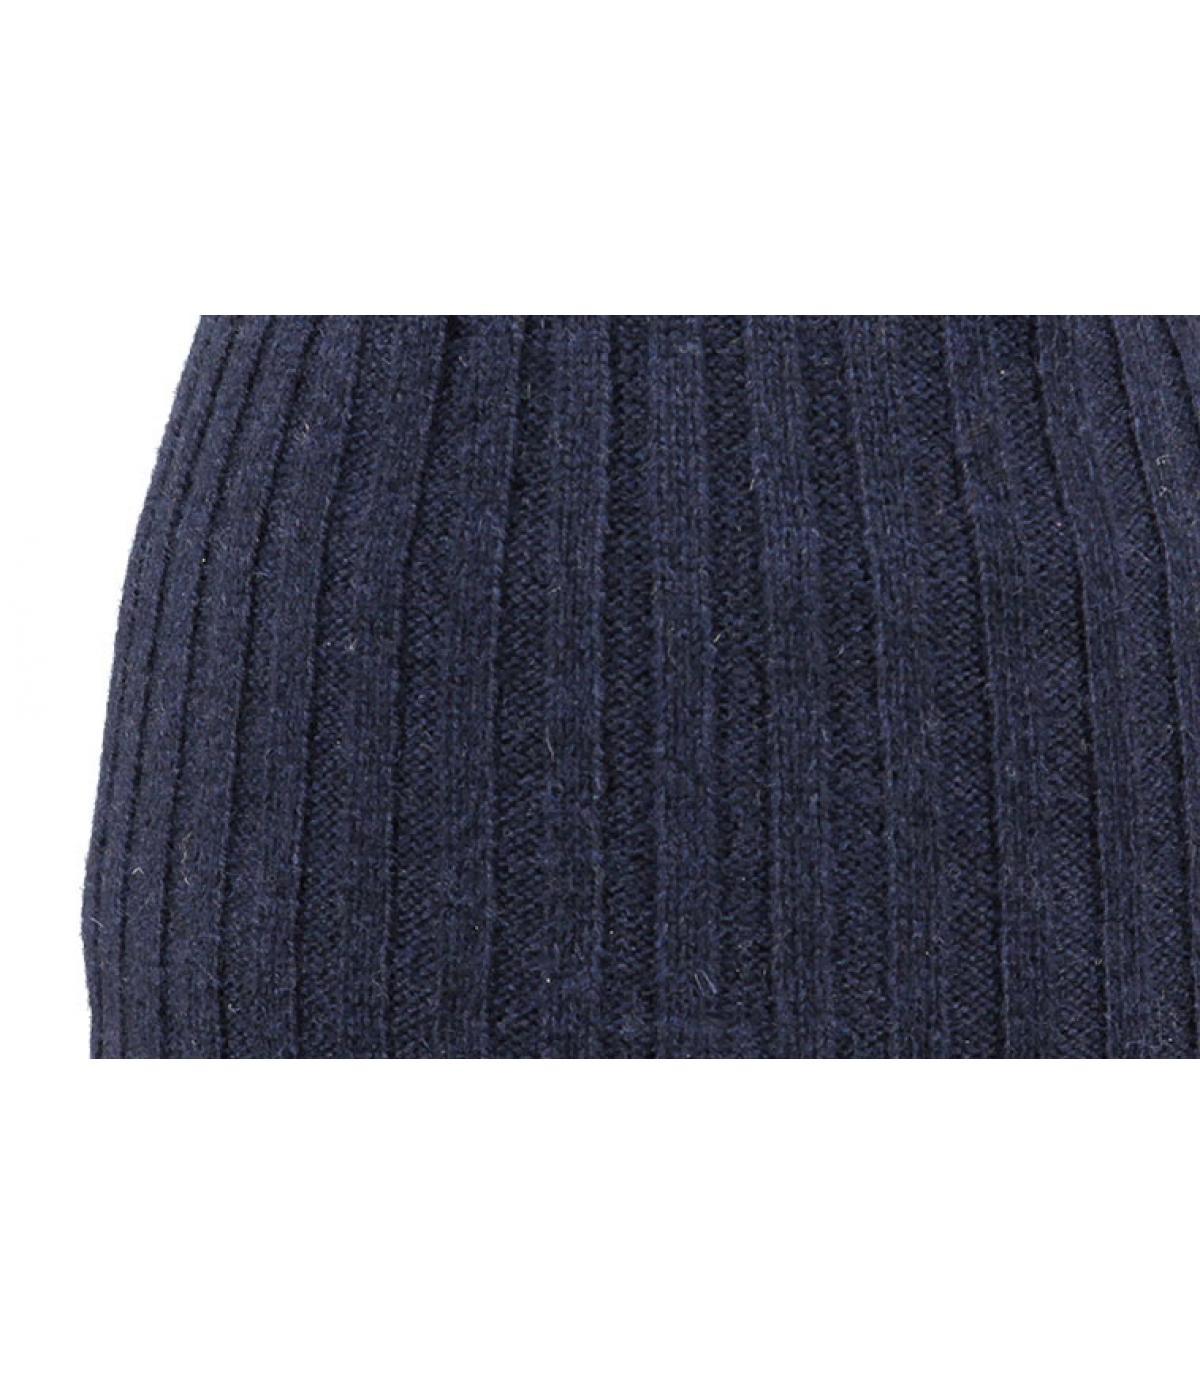 Details Haakon marineblau - Abbildung 2